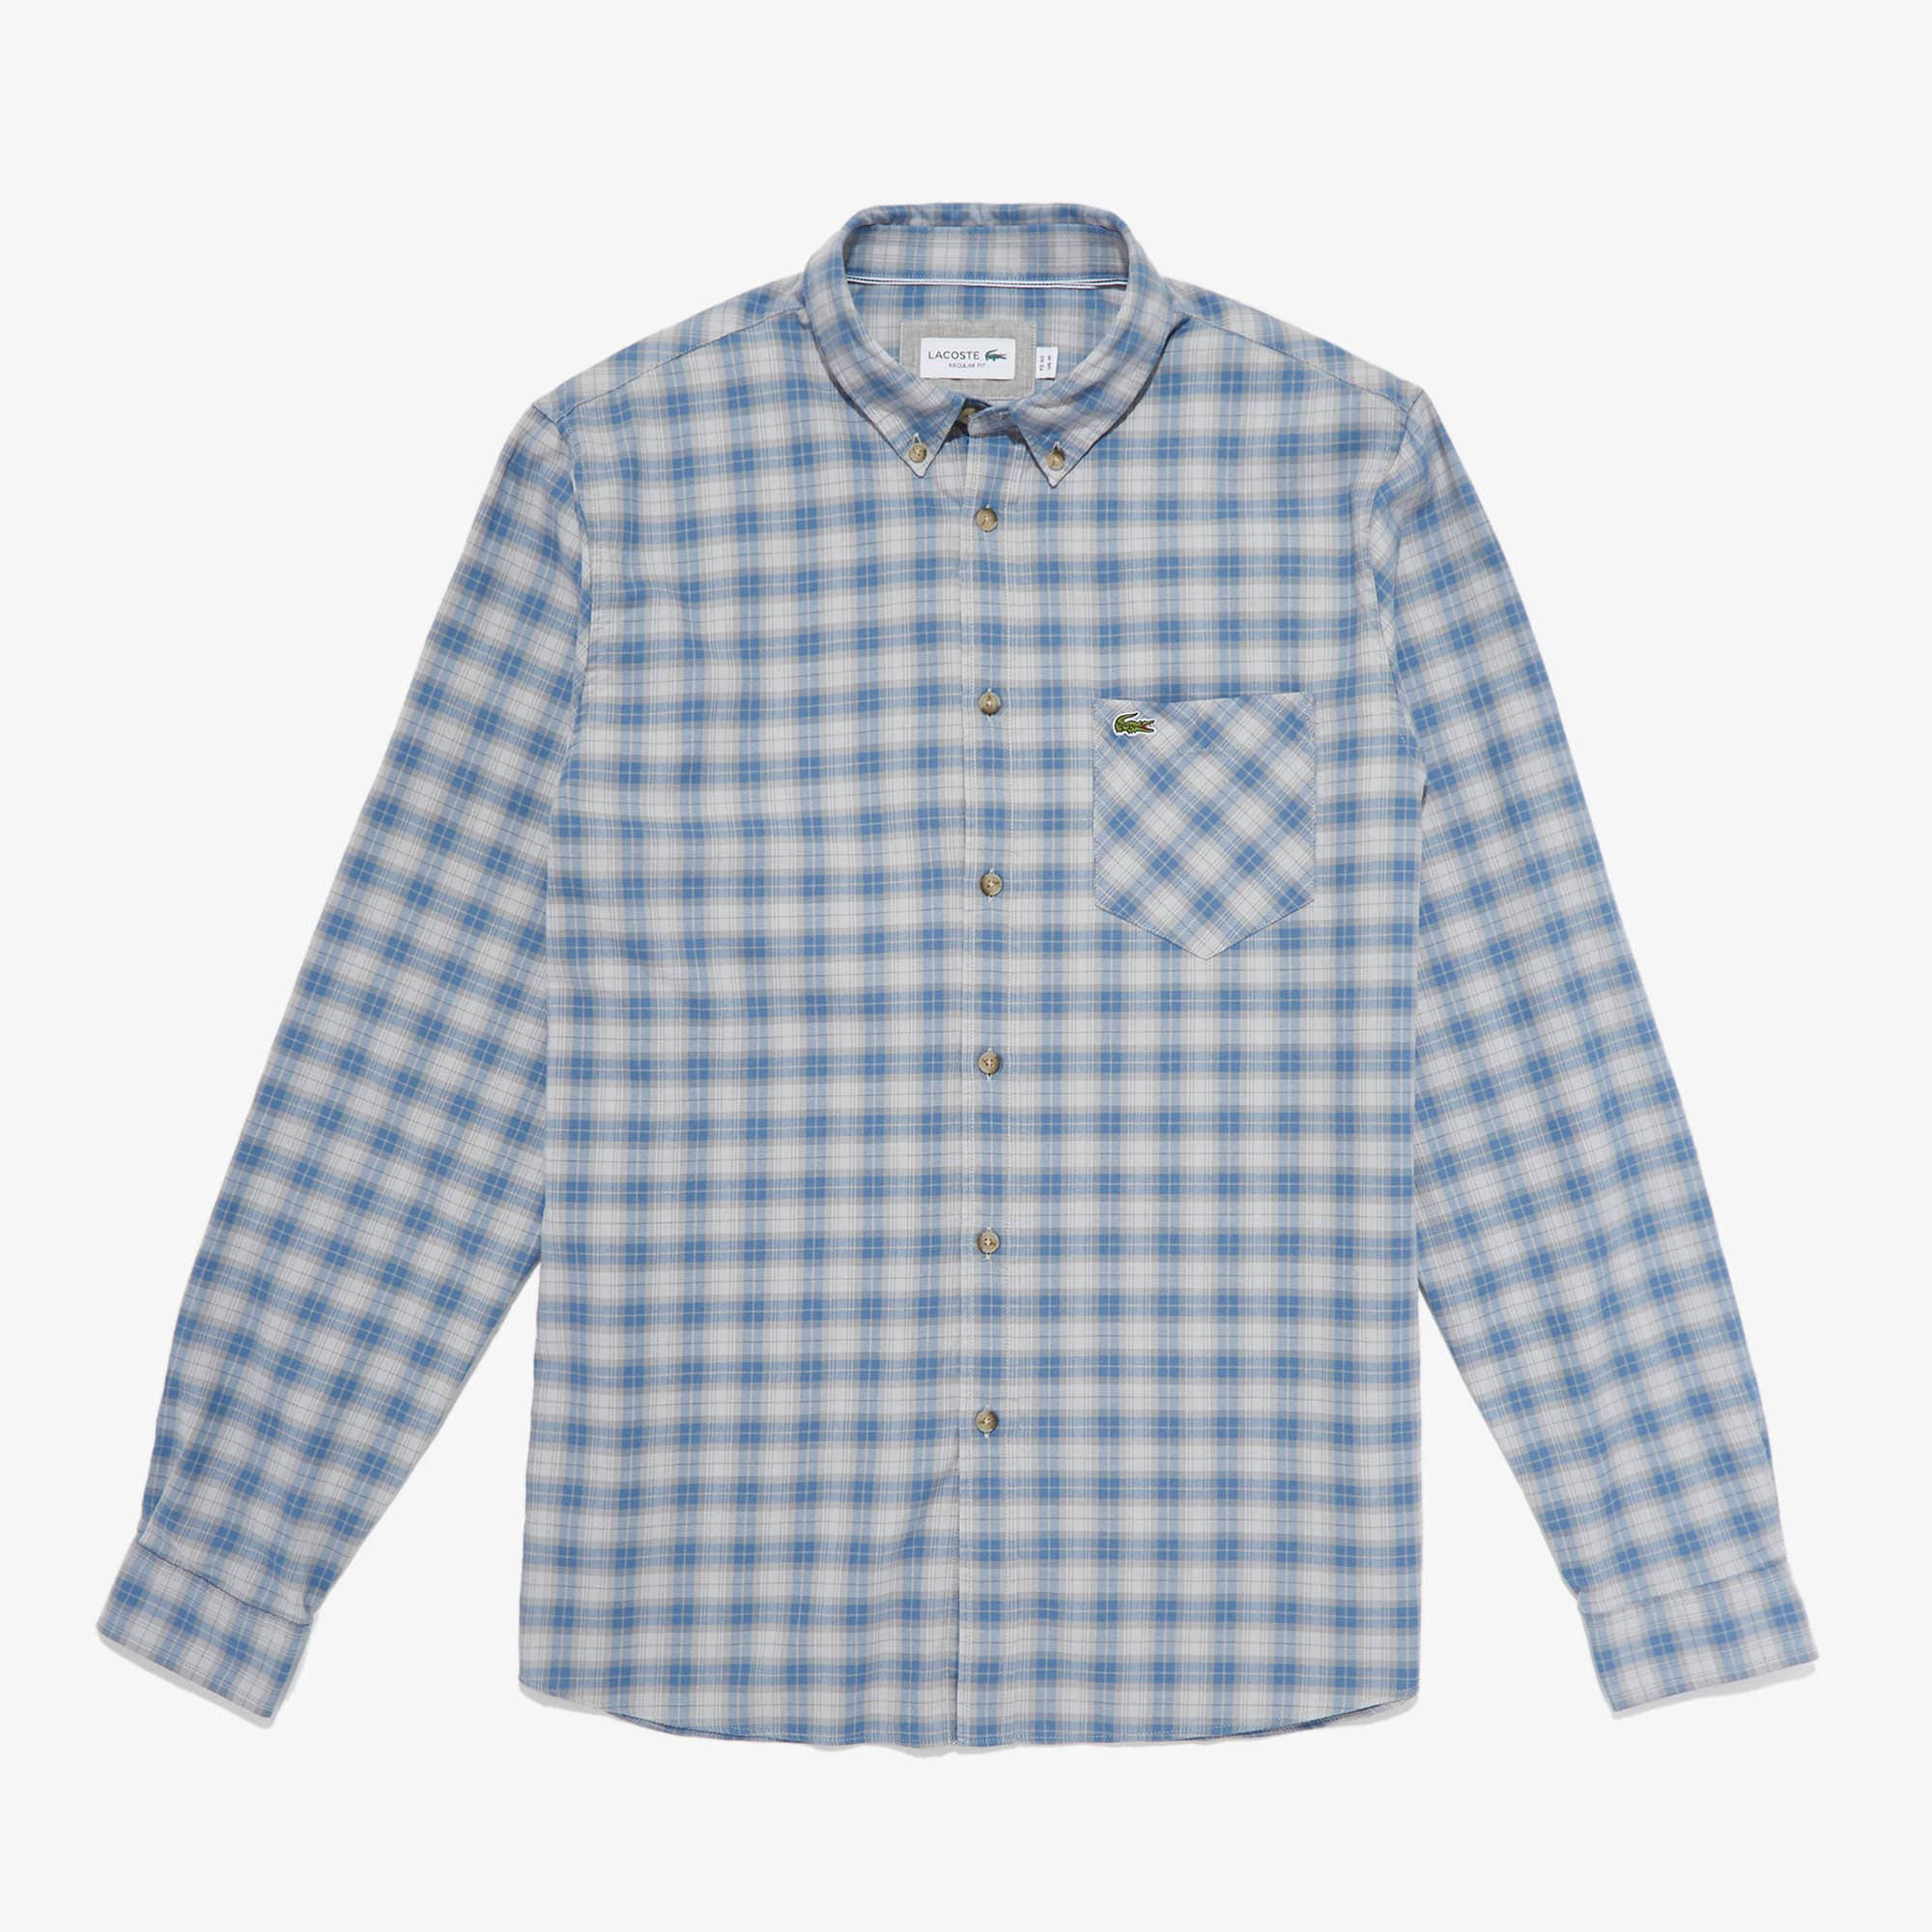 Lacoste Tops Men's Regular Fit Check Cotton Shirt